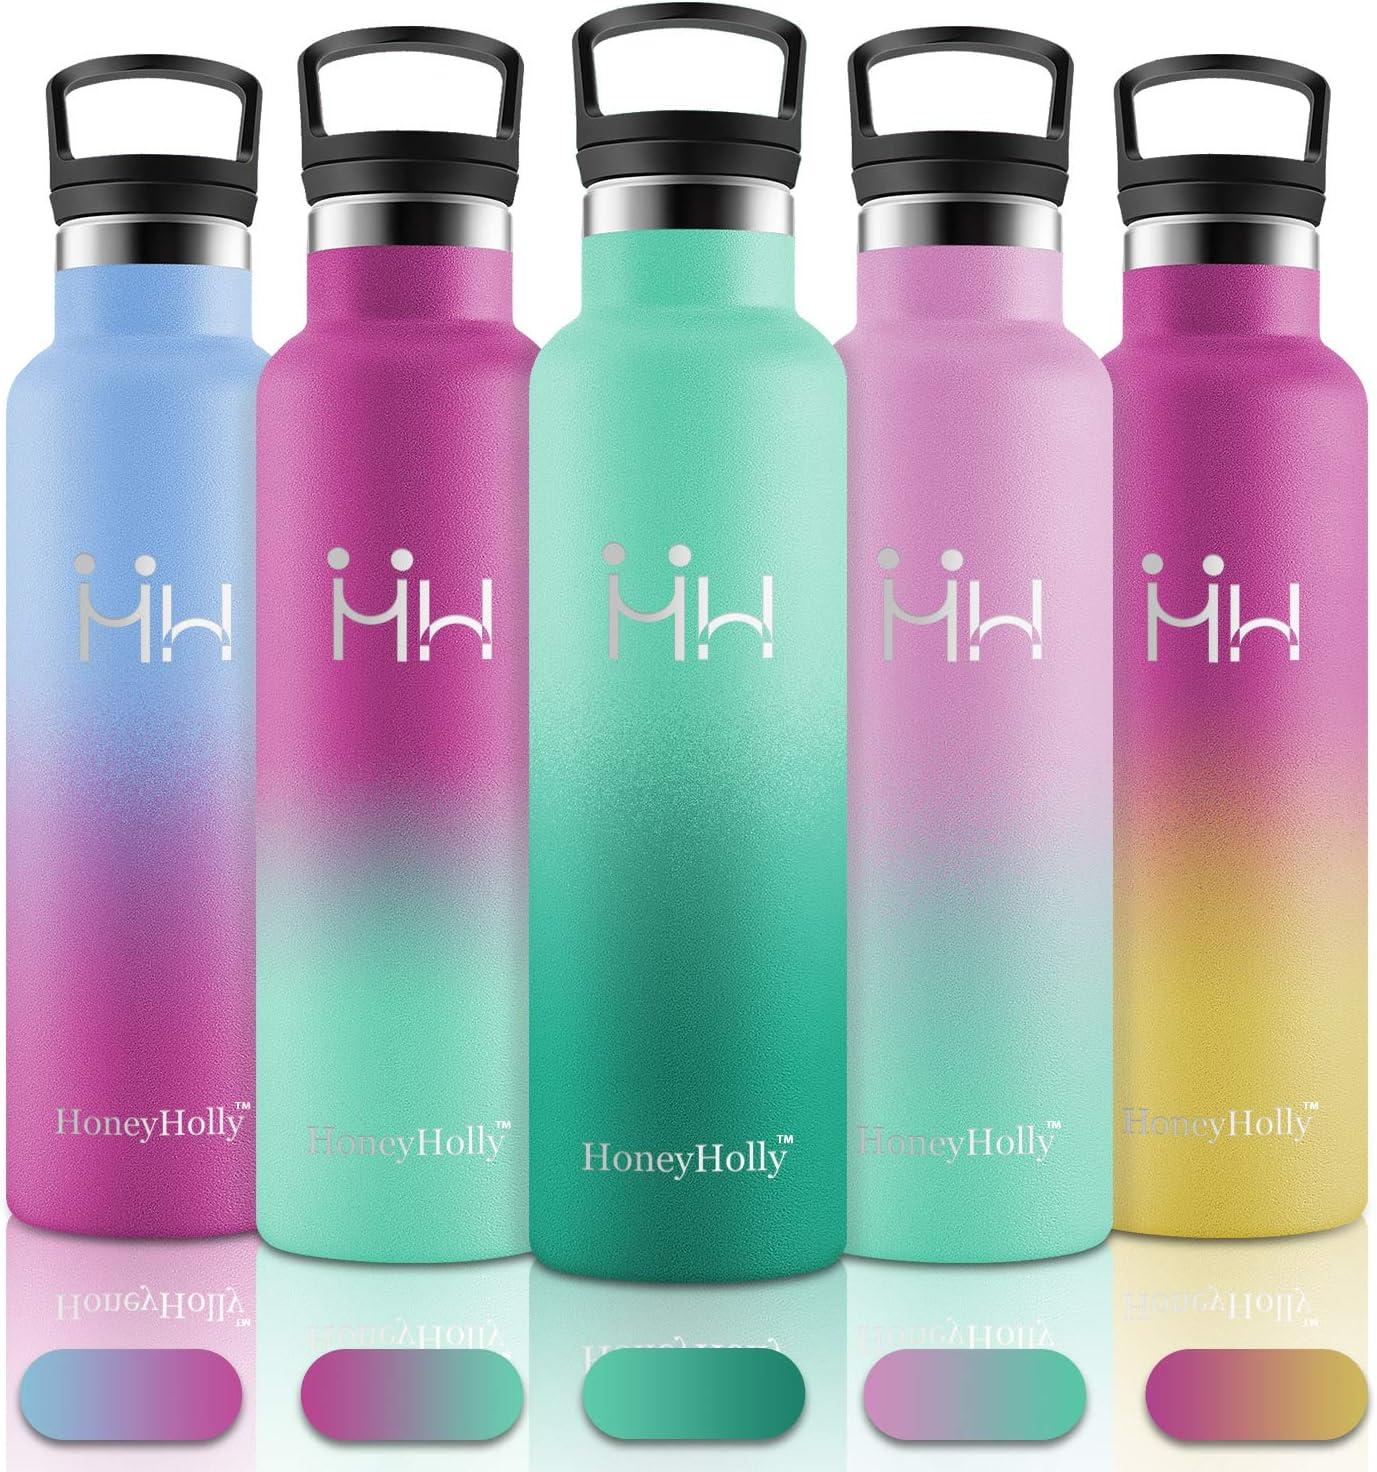 HoneyHolly Botellas Agua Acero Inoxidable, 600ml Reutilizable sin BPA Termos, Personalizada Cantimploras Botella para Niños, Bebé, Deportiva, Gimnasio, Bicicleta, Tazas Cafe Térmicas